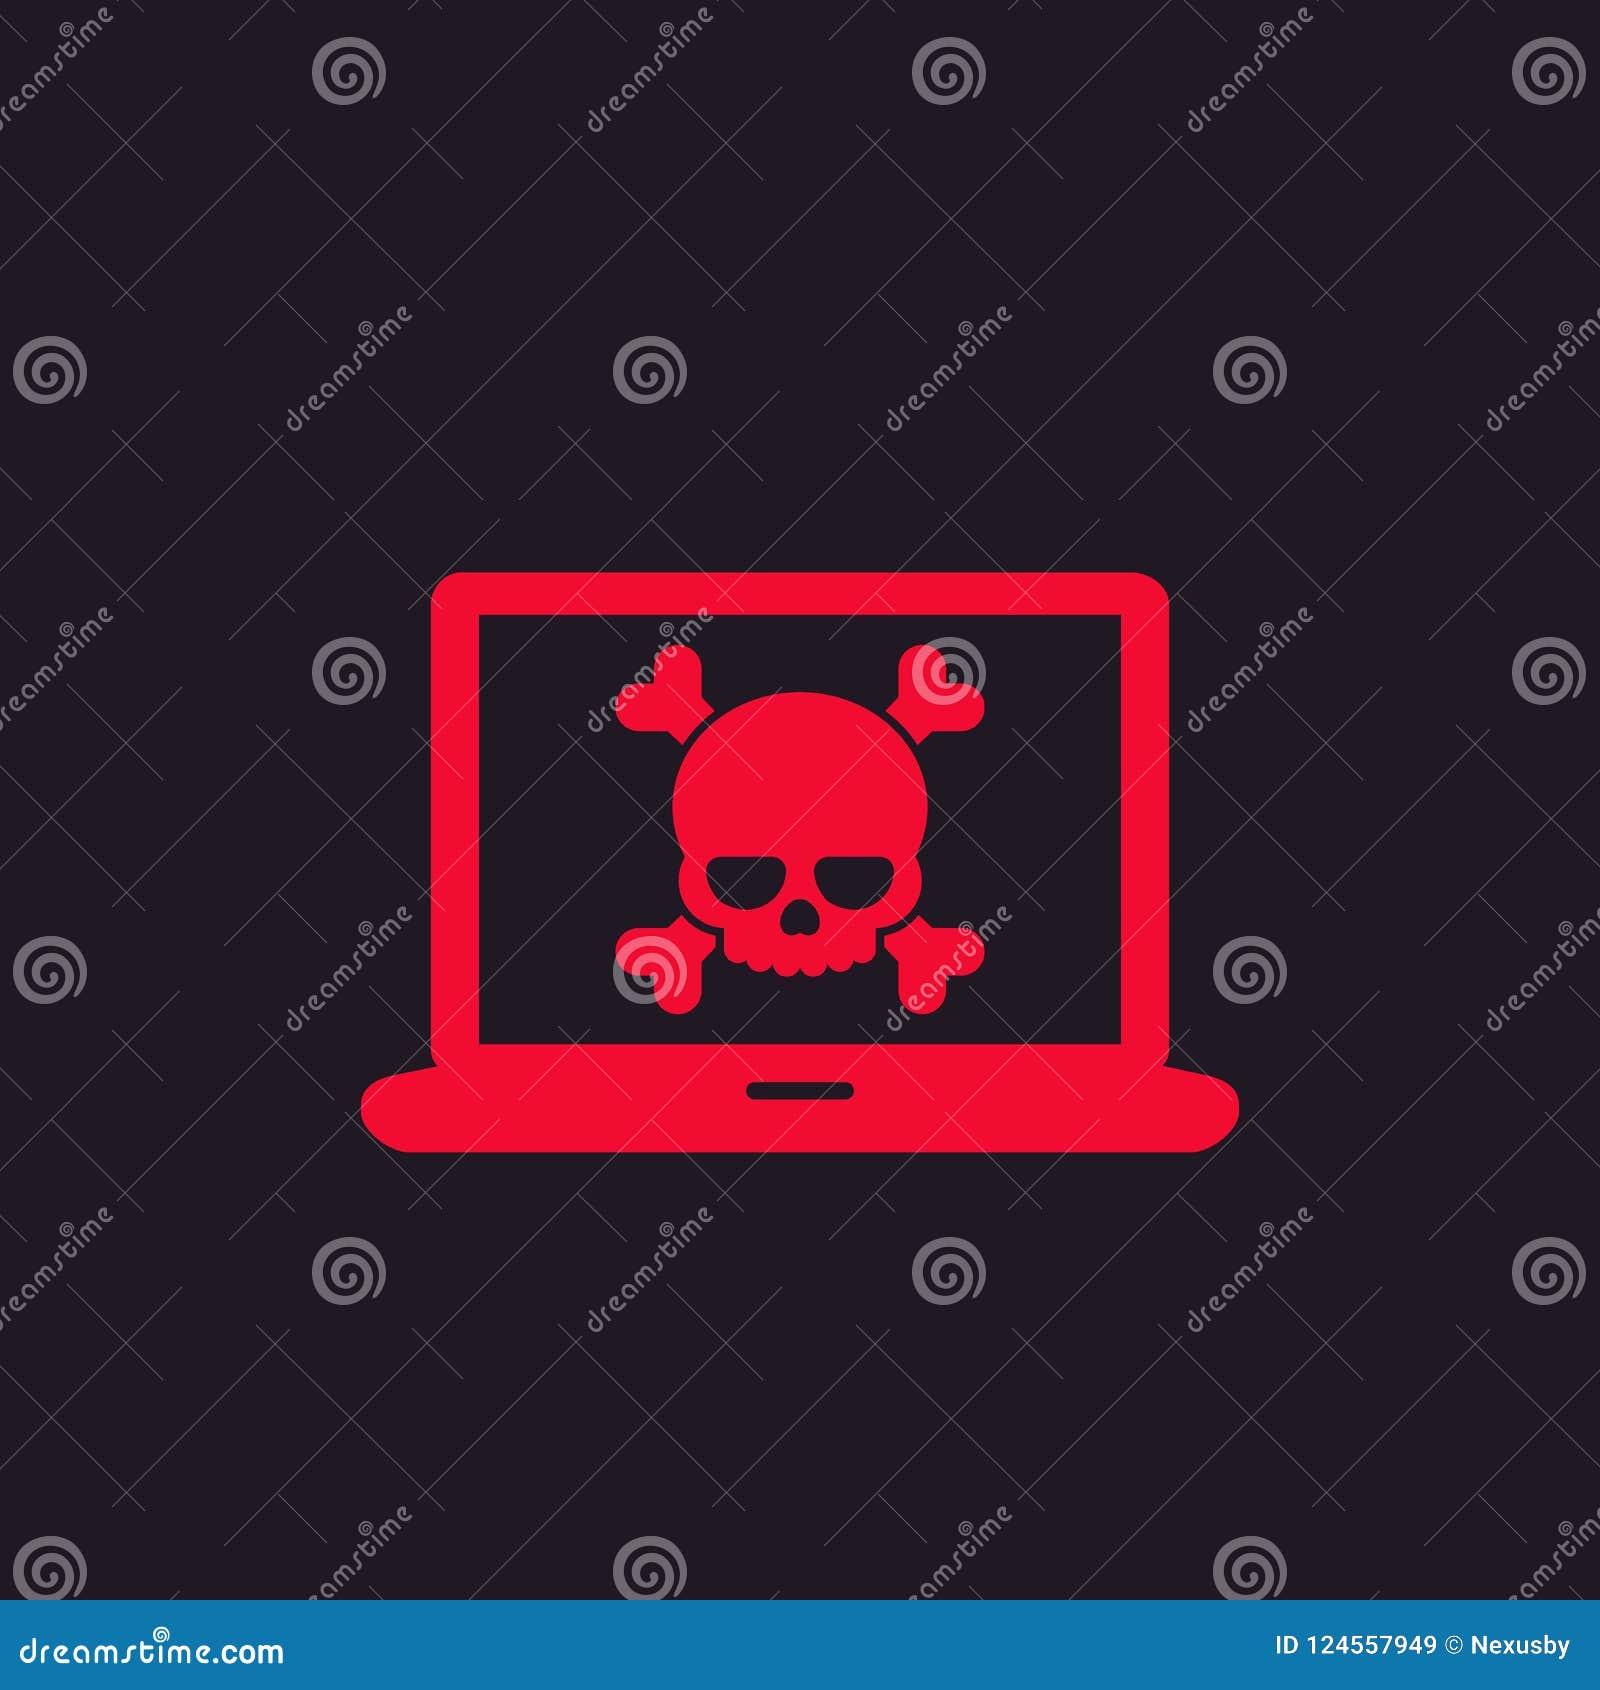 Malware, spam, σε απευθείας σύνδεση απάτη, εικονίδιο ιών υπολογιστών